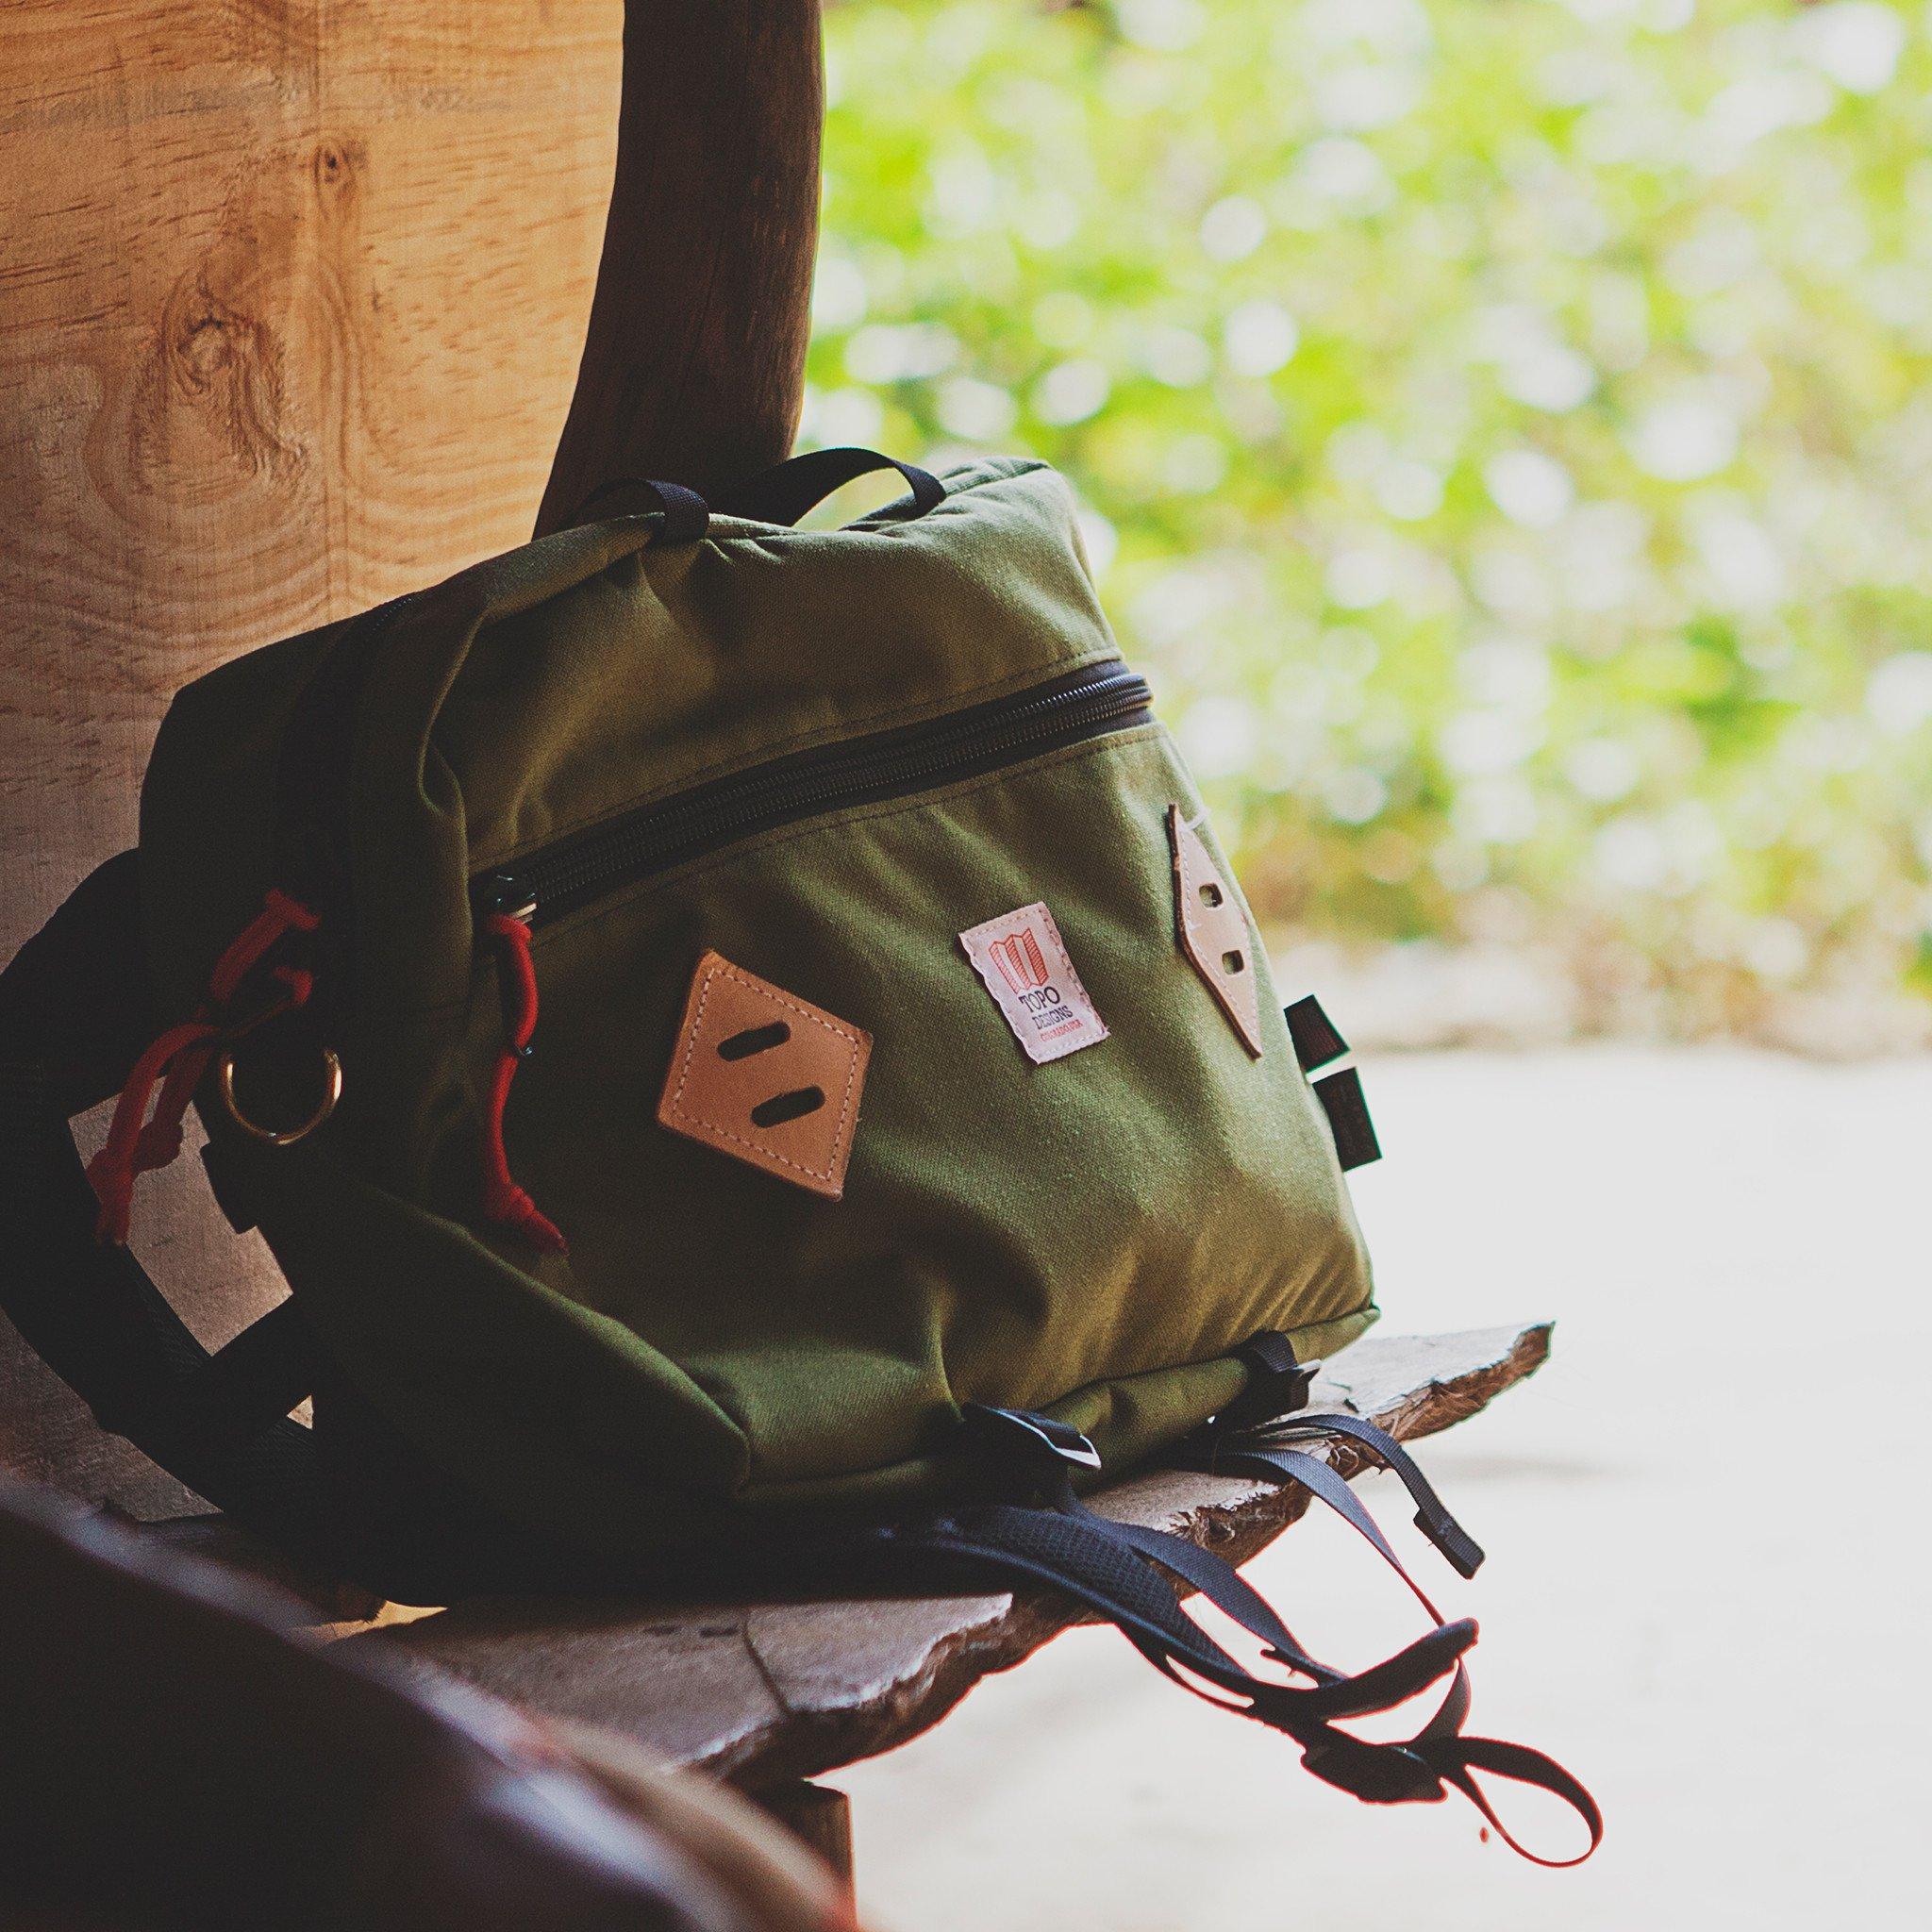 bags-mountain-briefcase-11_2048x2048.jpg